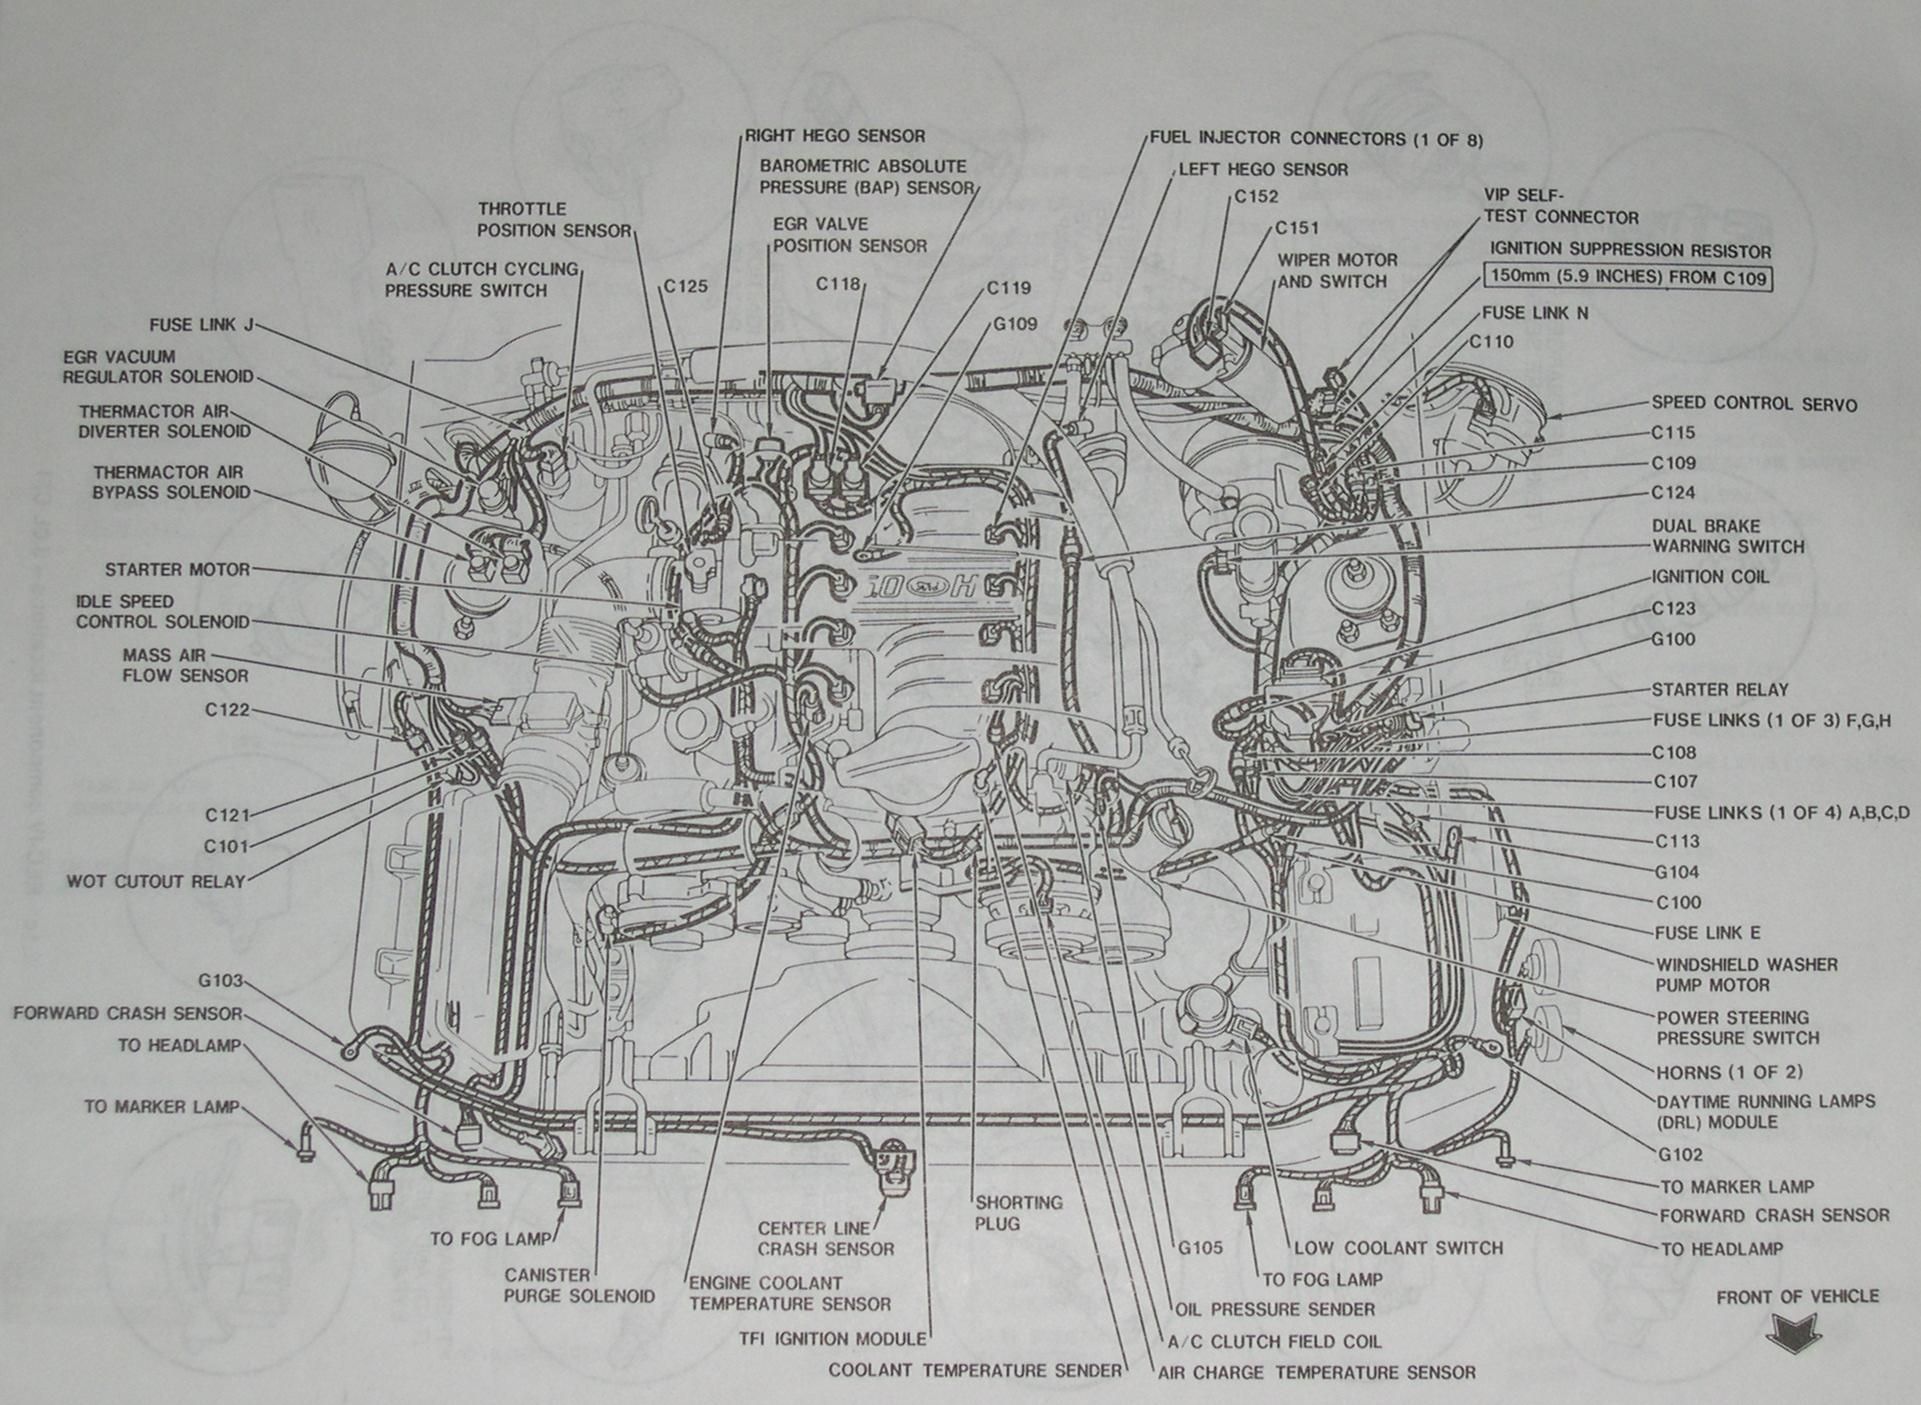 92 Mustang Engine Diagram Wiring Diagram View A View A Zaafran It